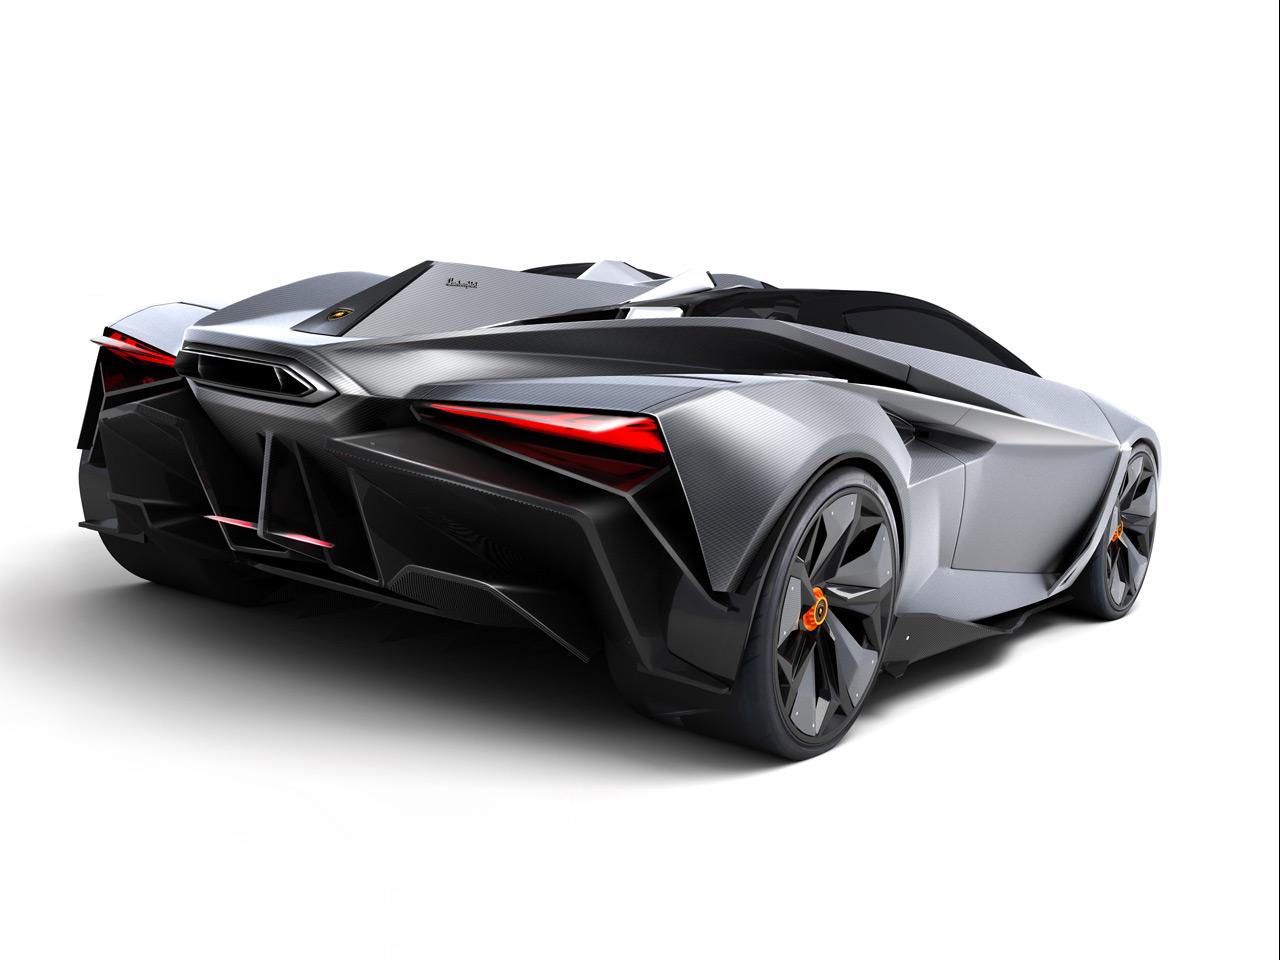 Bugatti Veyron Going Back To The Future Art Promo: Lamborghini Perdigón Concept To Rival Bugatti Veyron